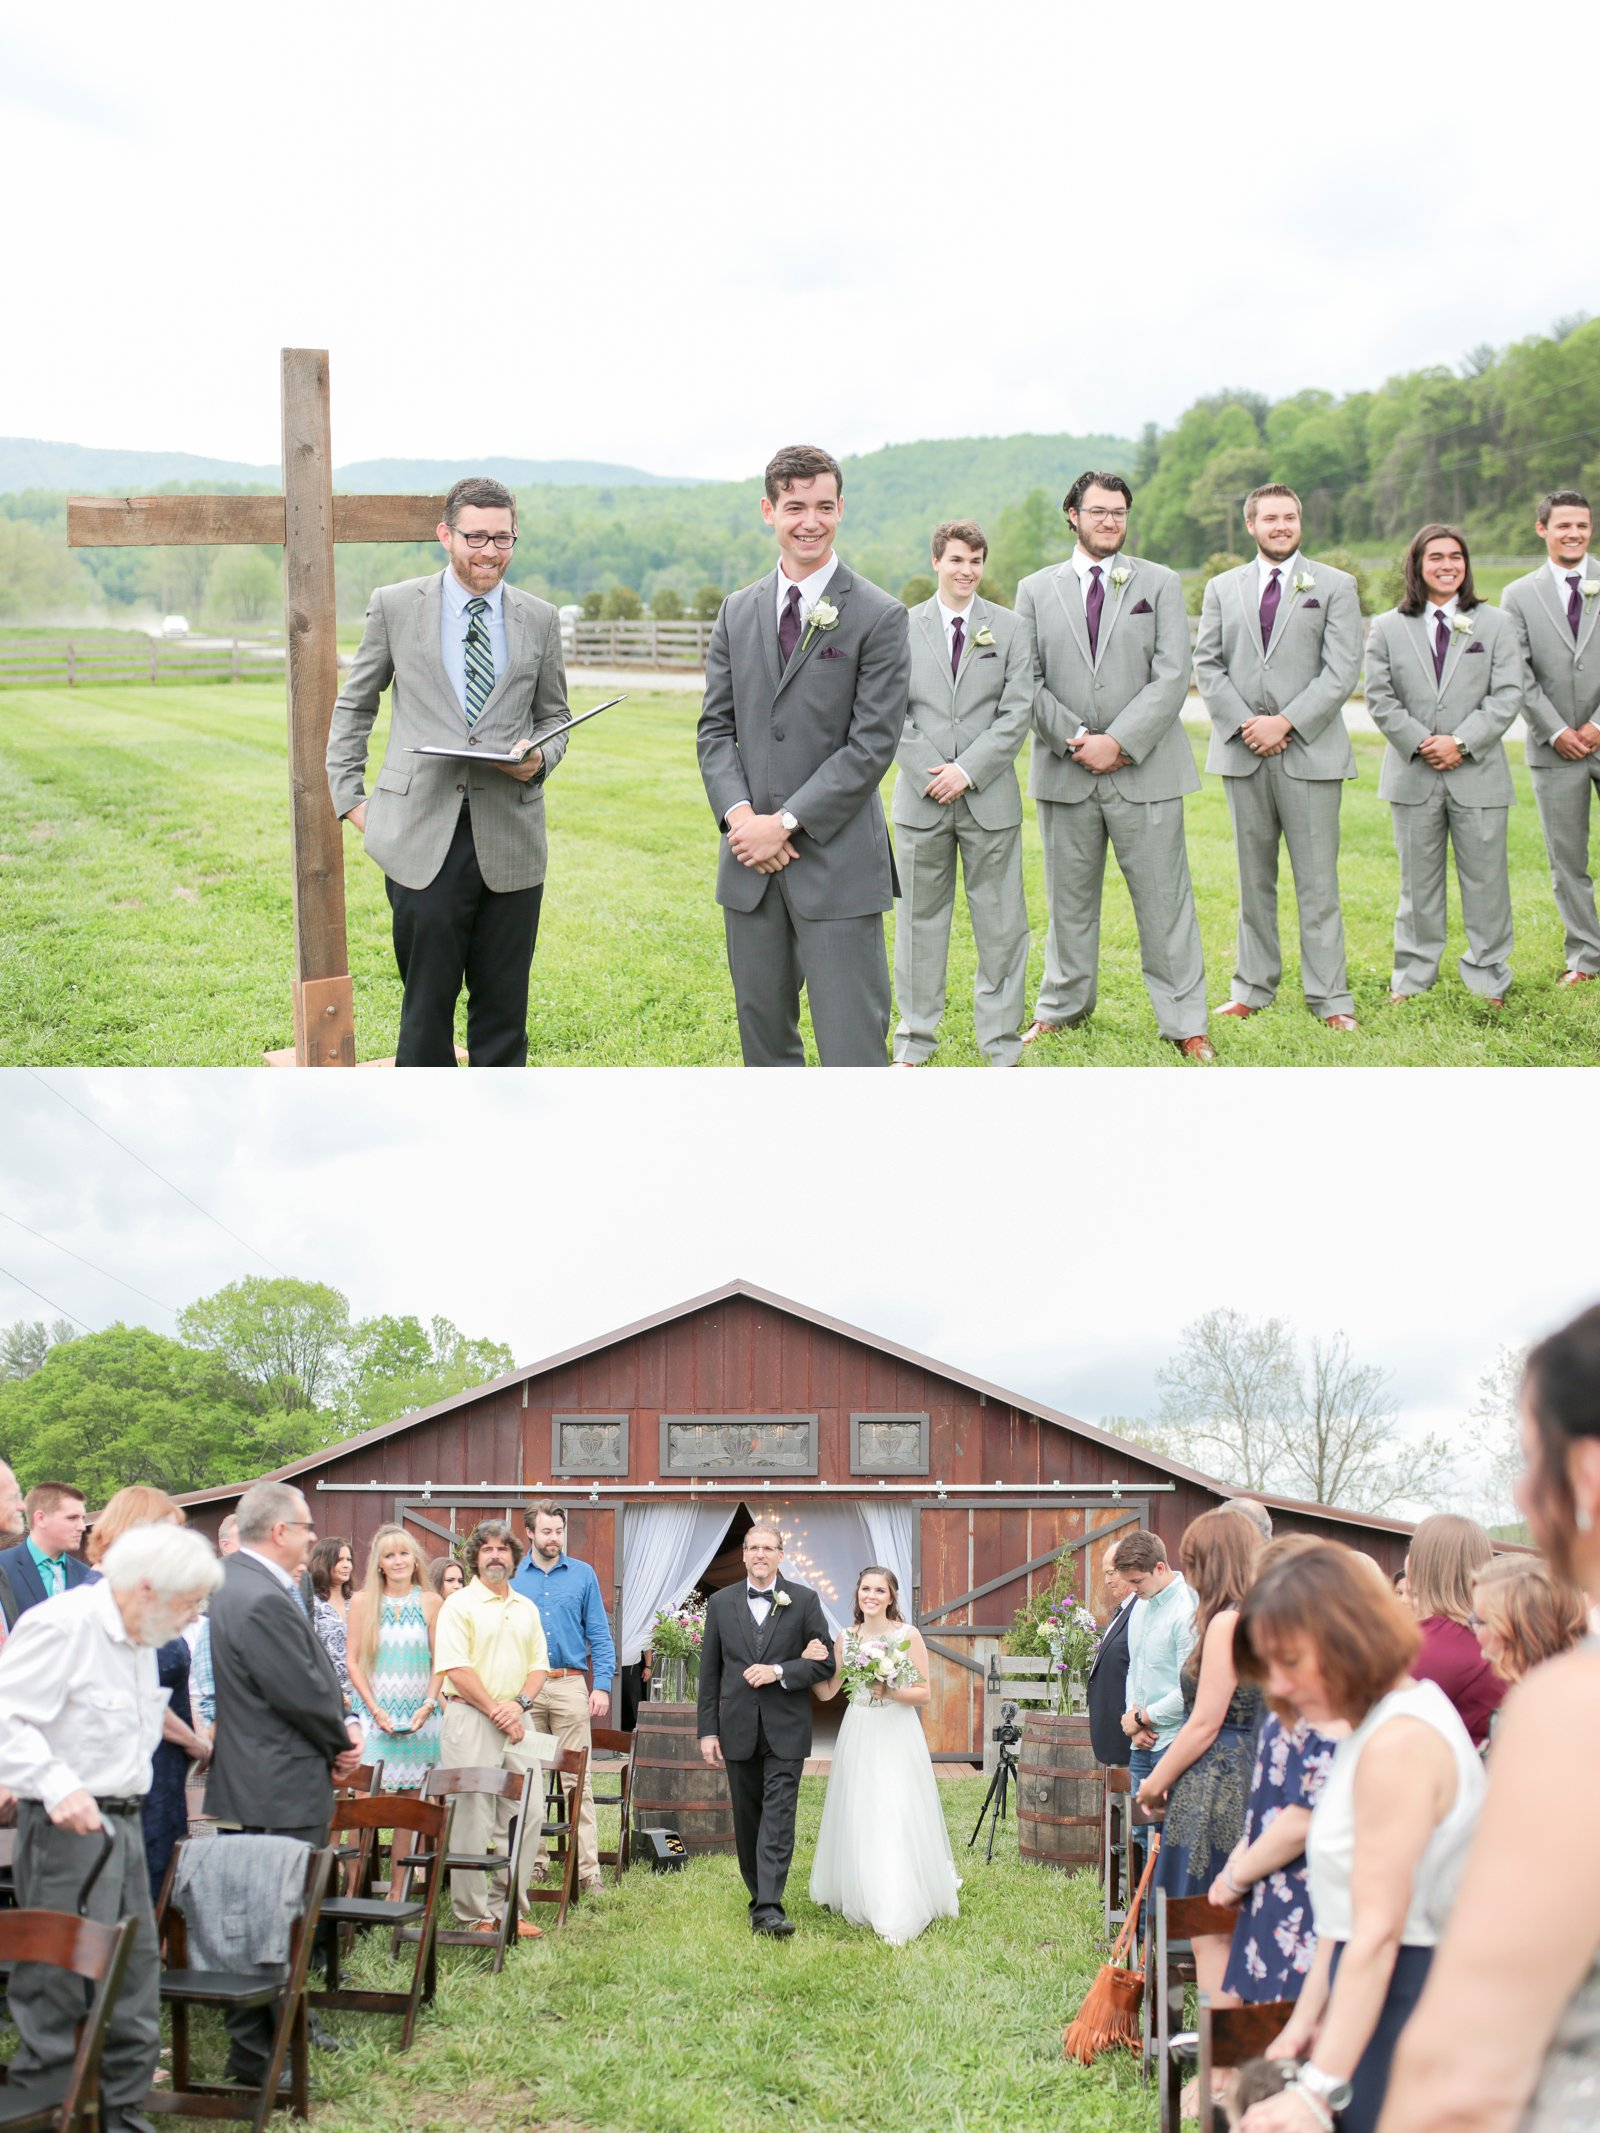 wedding_photographer_Missouri_Destination_elope_intimate_Saint_James_MO_Missouri_KansasCity_Jeff_City_Jefferson_Columbia_Engagement_Photos_Pictures_Session_Best_Videographer_0182.jpg